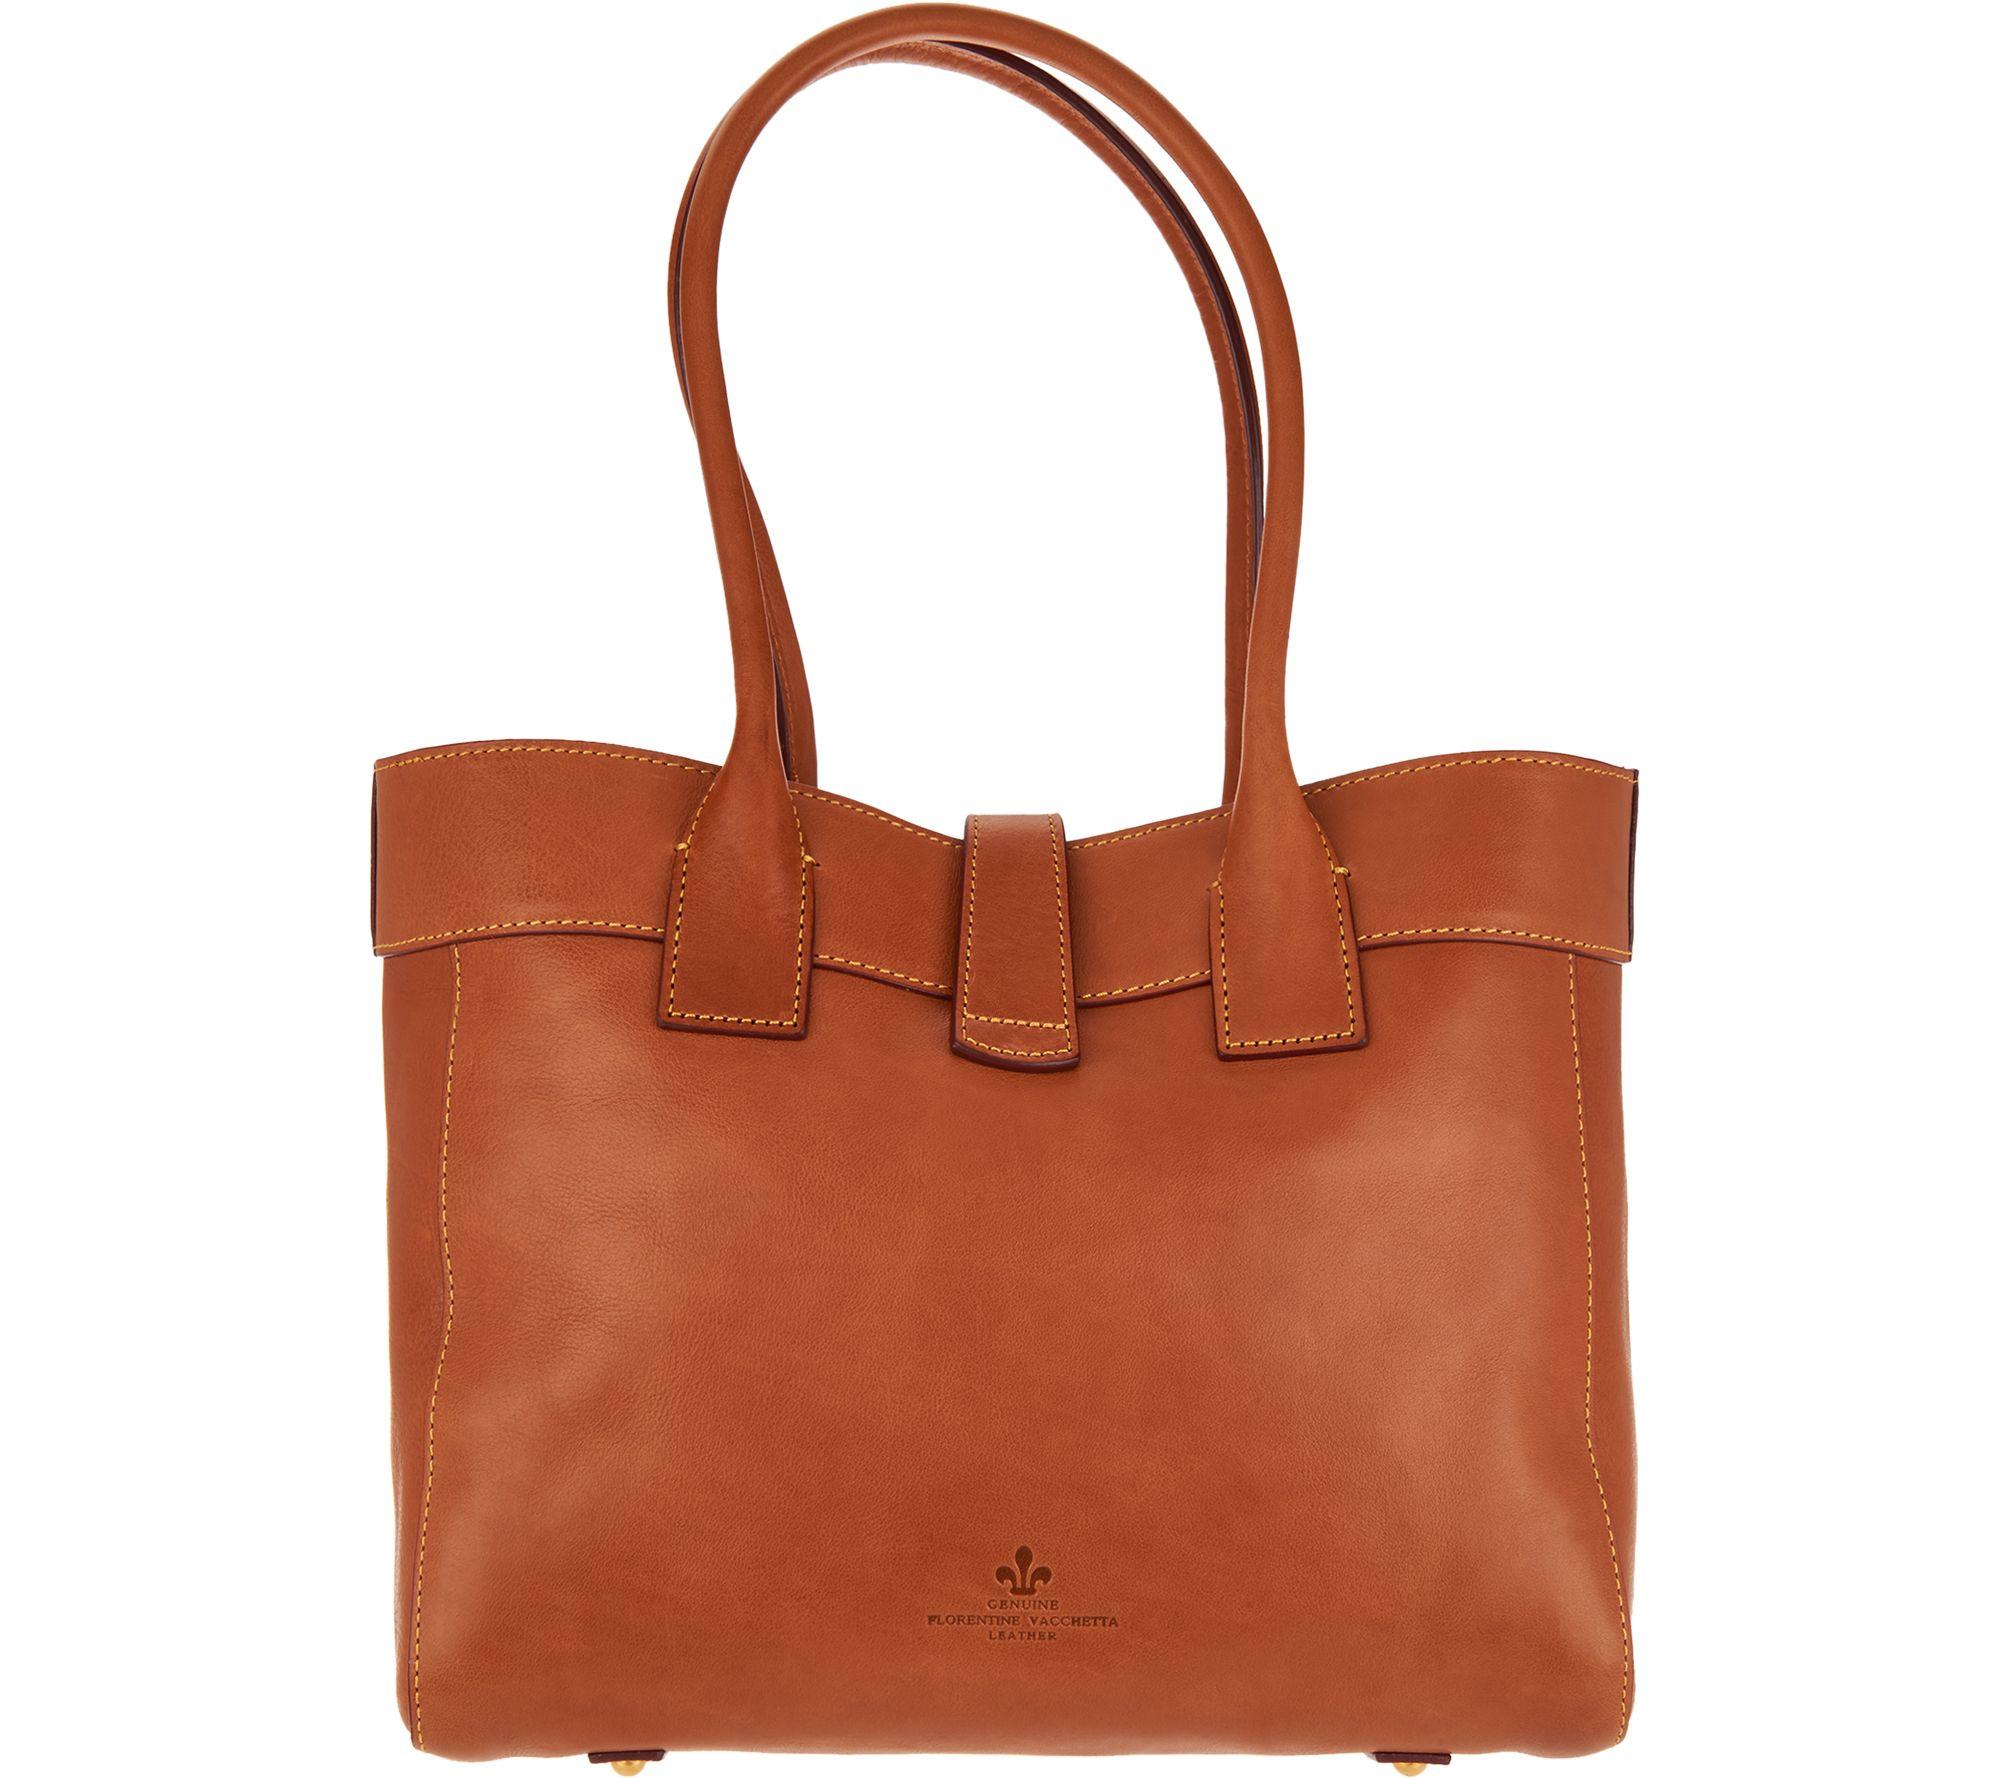 dee3709e189a Dooney   Bourke Florentine Leather Amelia Shoulder Bag — QVC.com